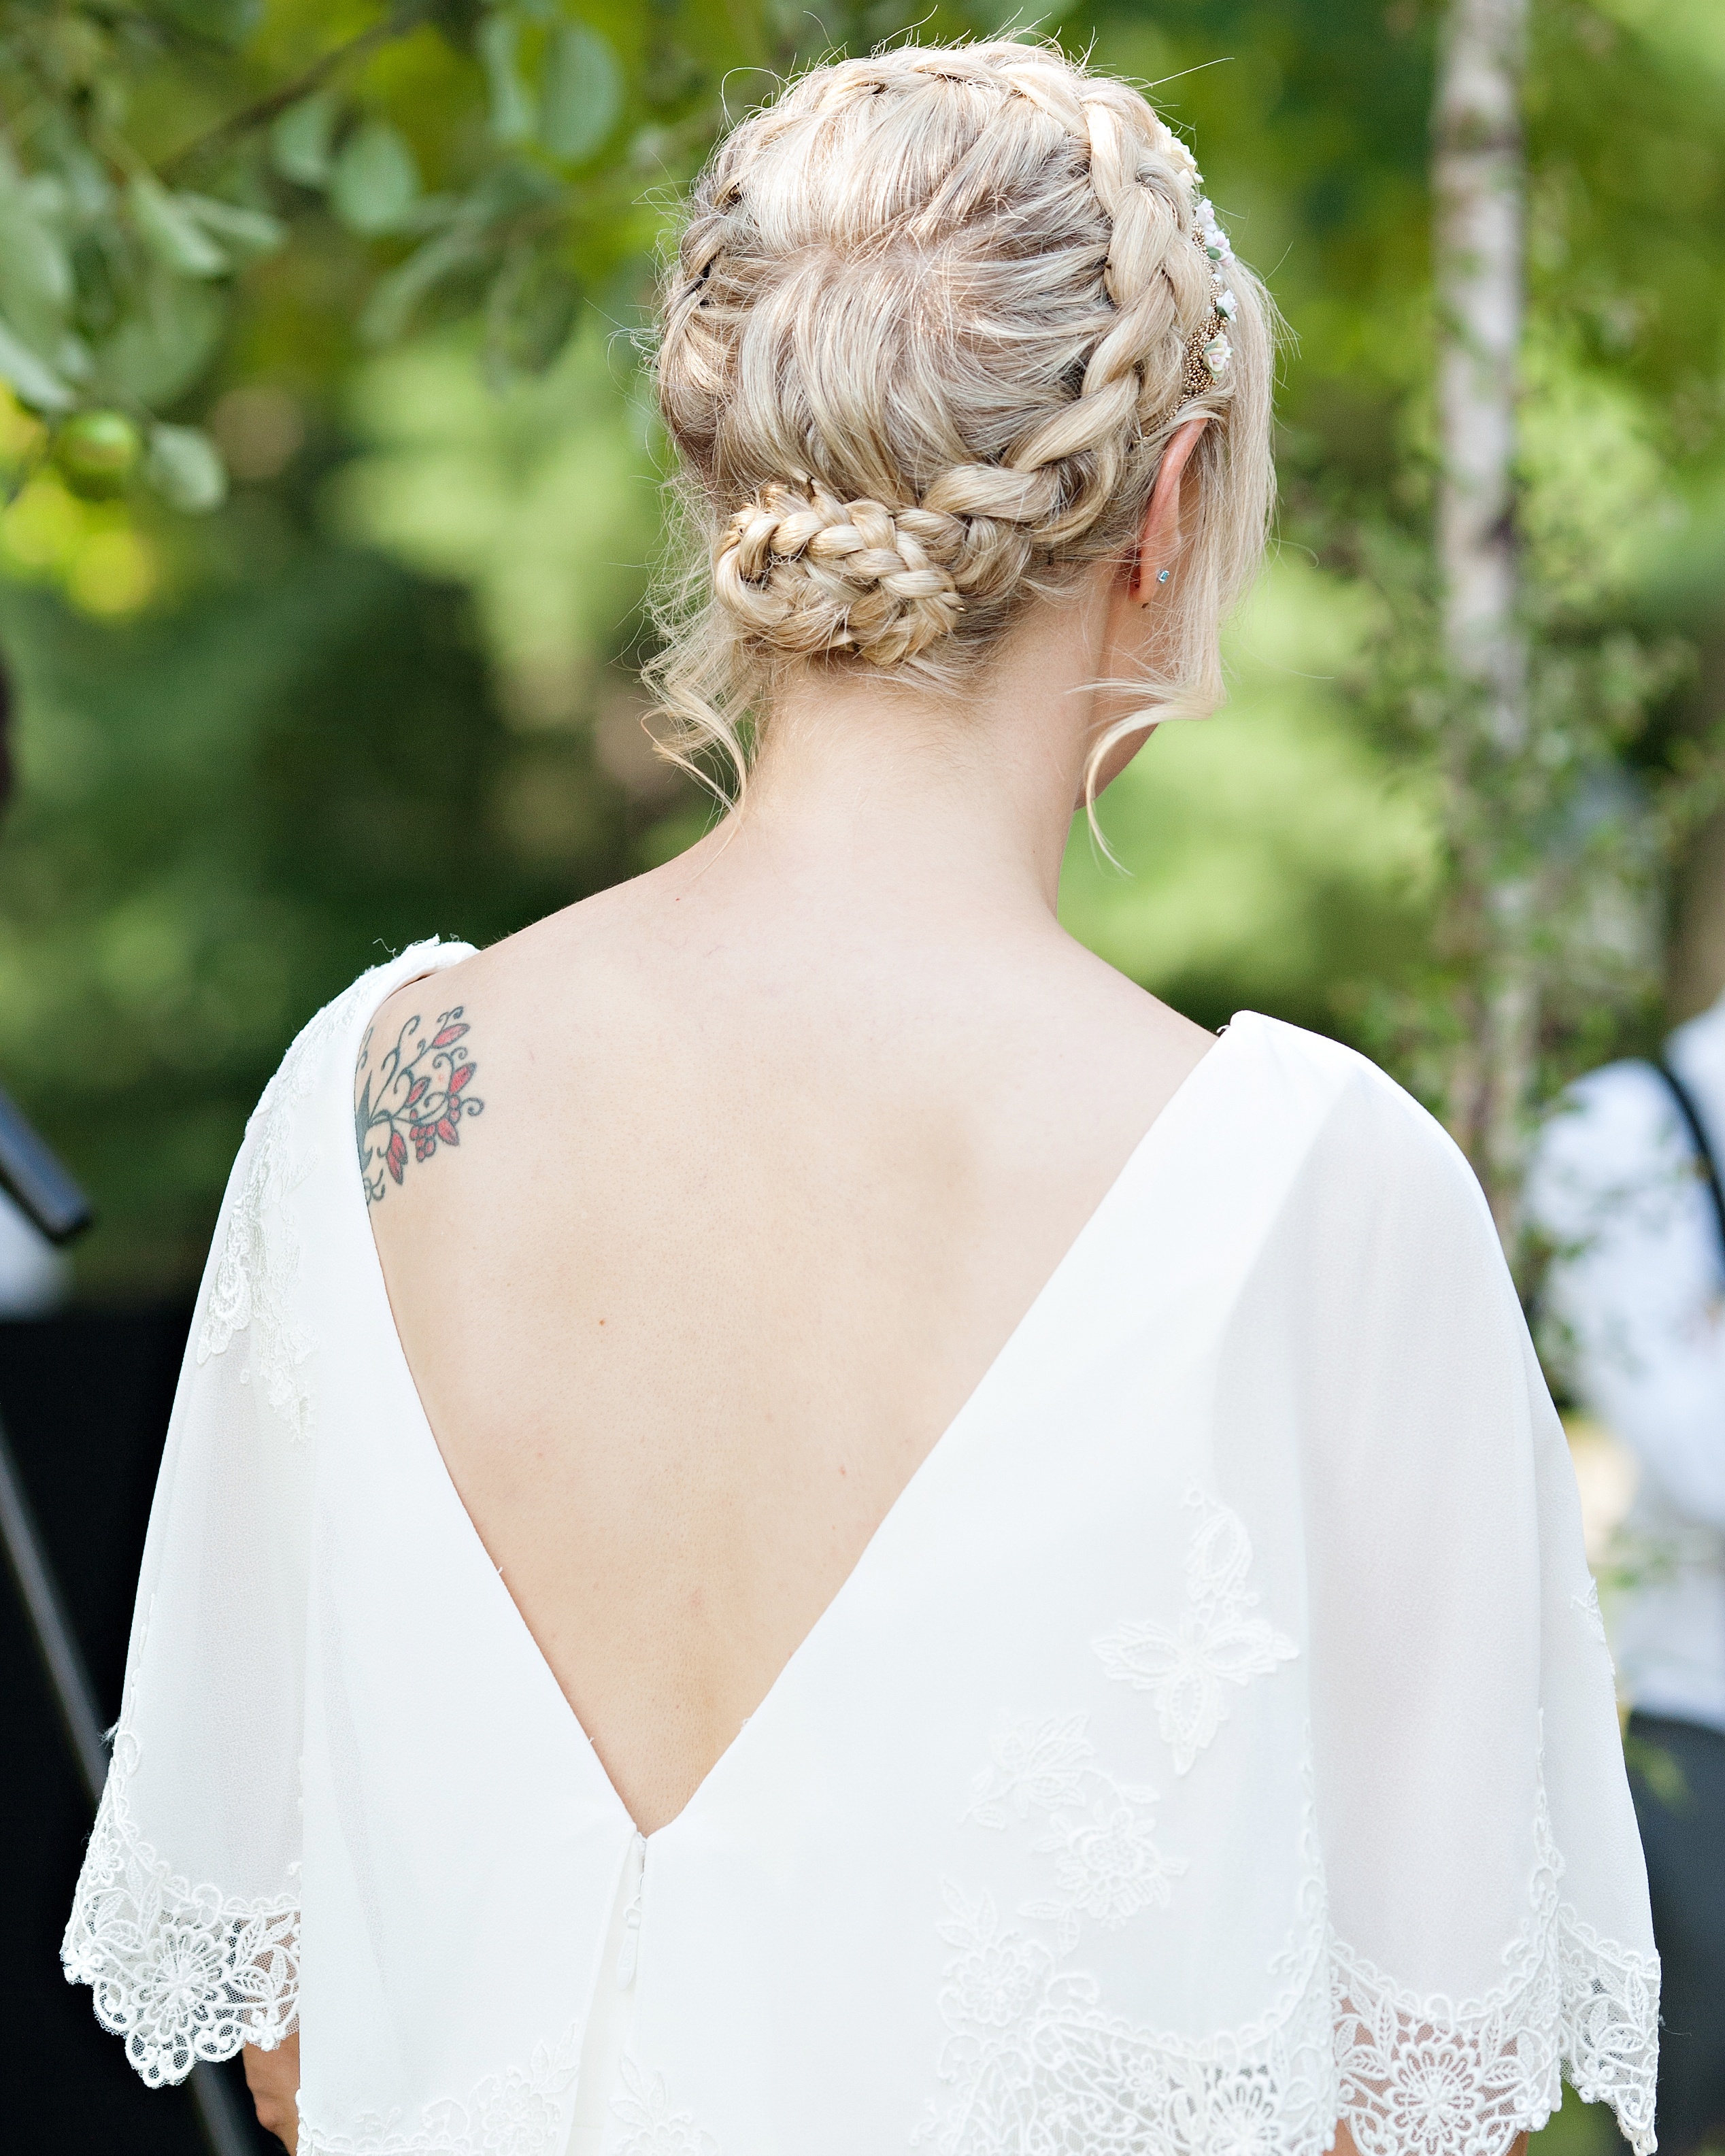 kristy-marc-wedding-hair-0414.jpg